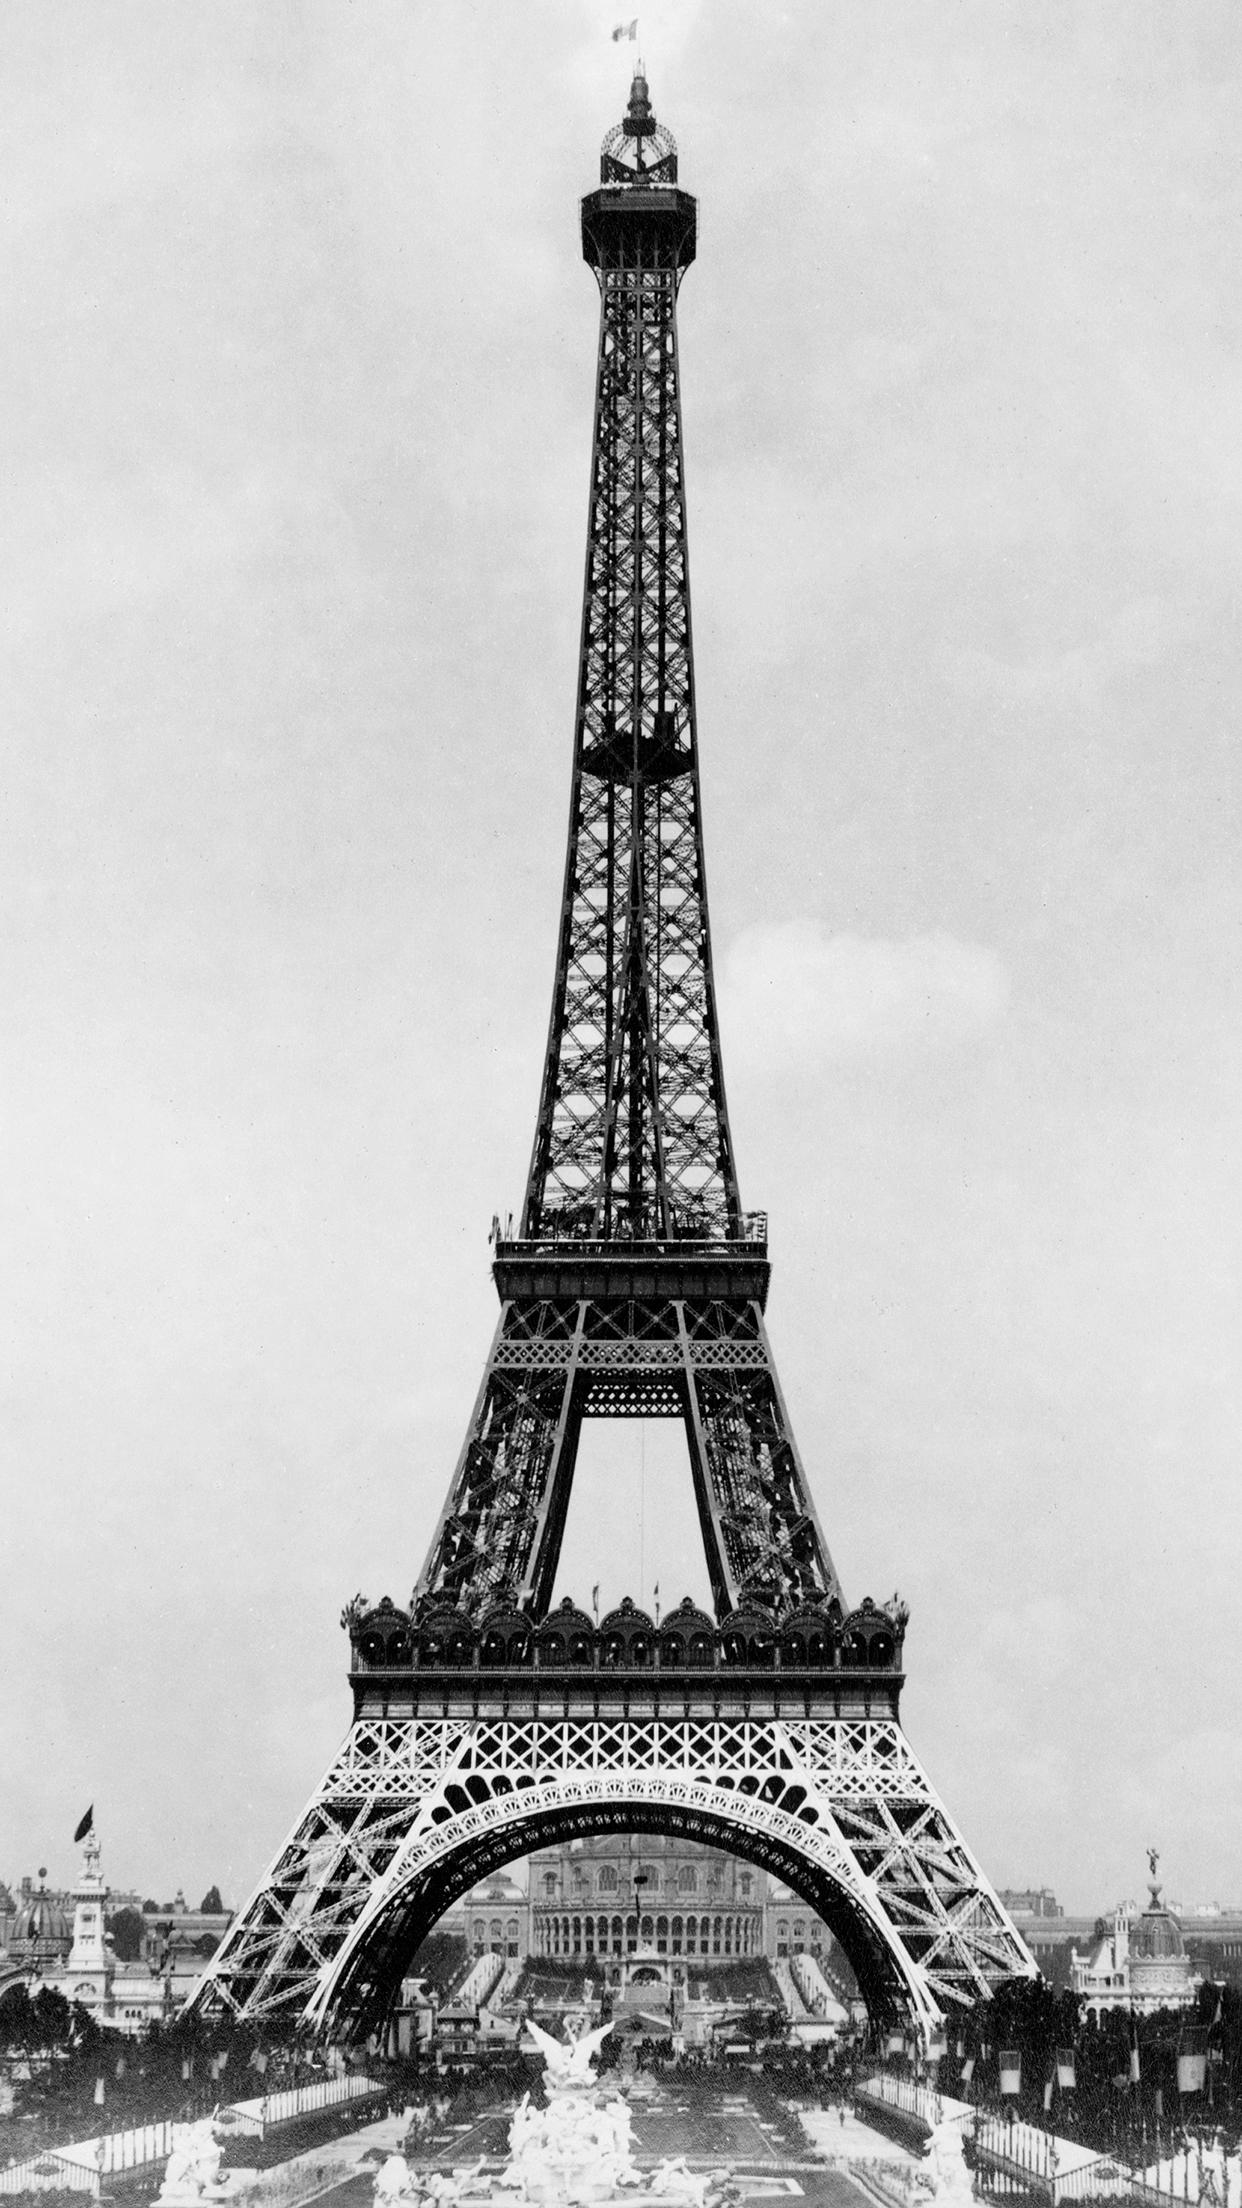 Eiffel Tower Retro 3Wallpapers iPhone Parallax Eiffel Tower Retro